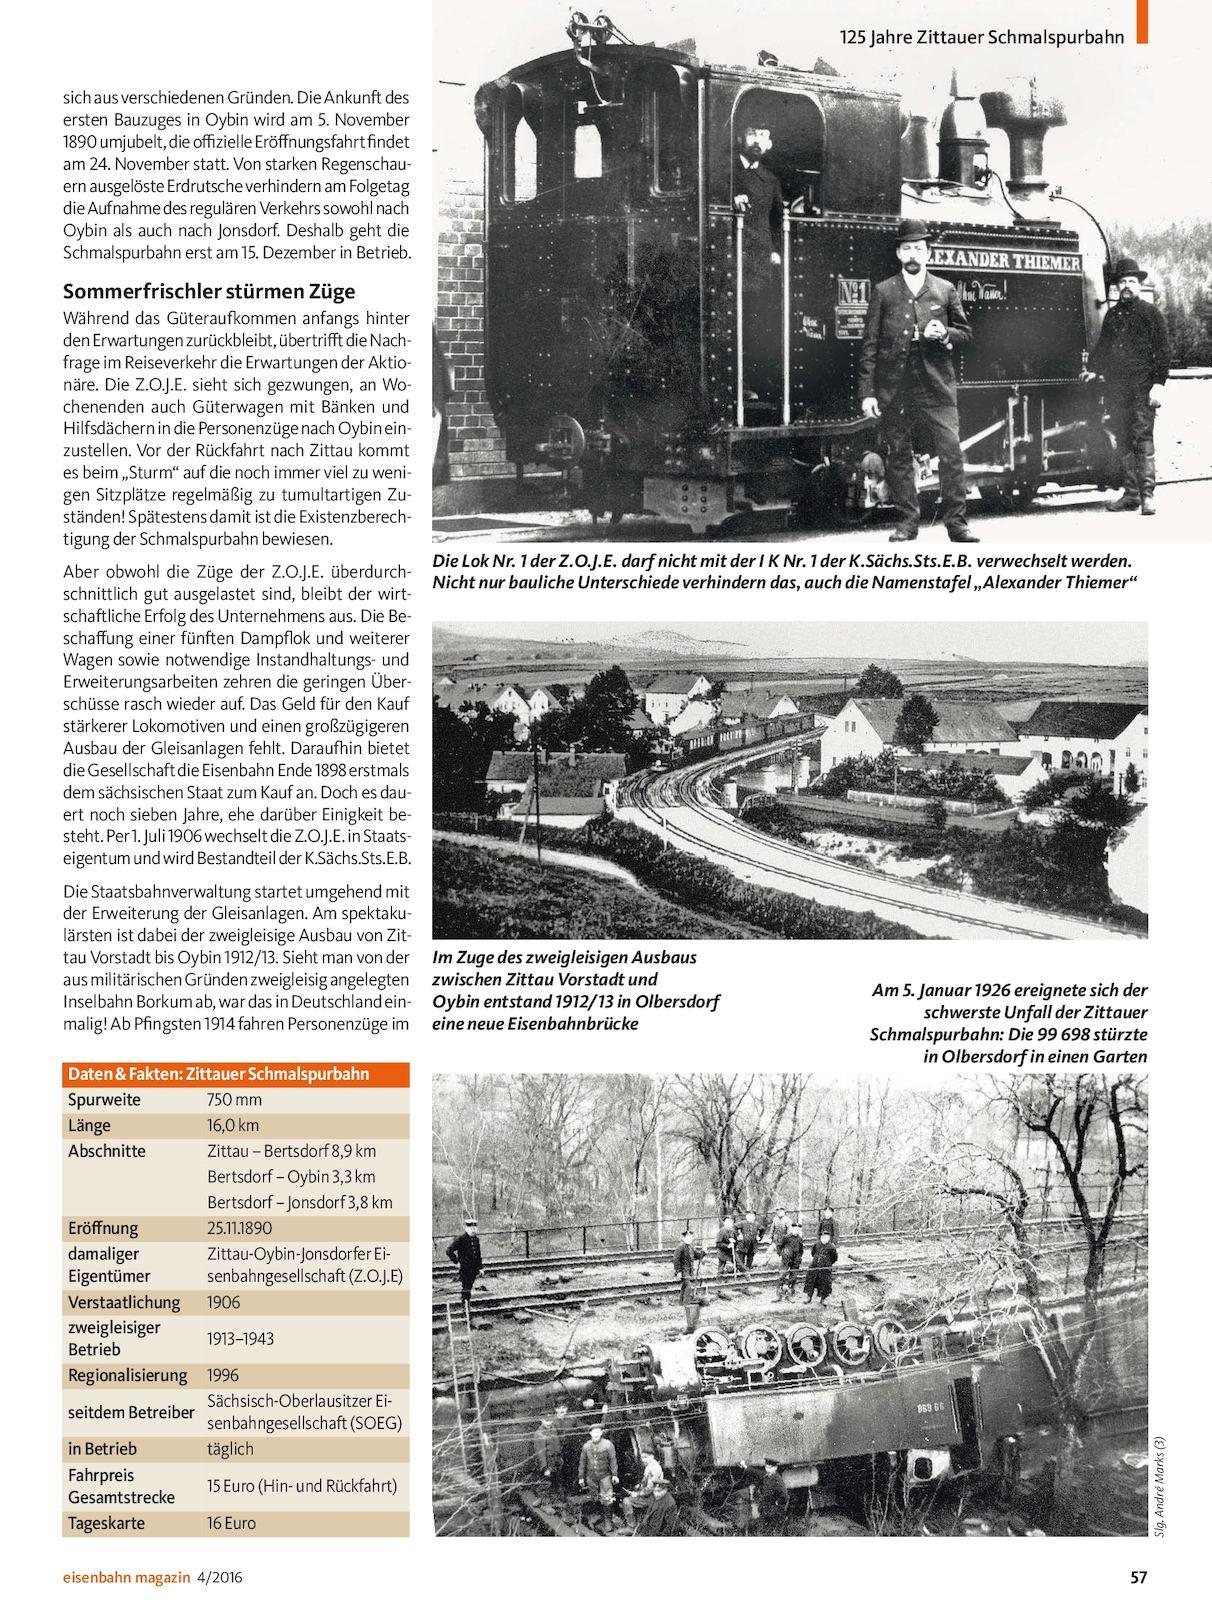 Eisenbahn Modellbahn Magazin 04 2016 - CALAMEO Downloader